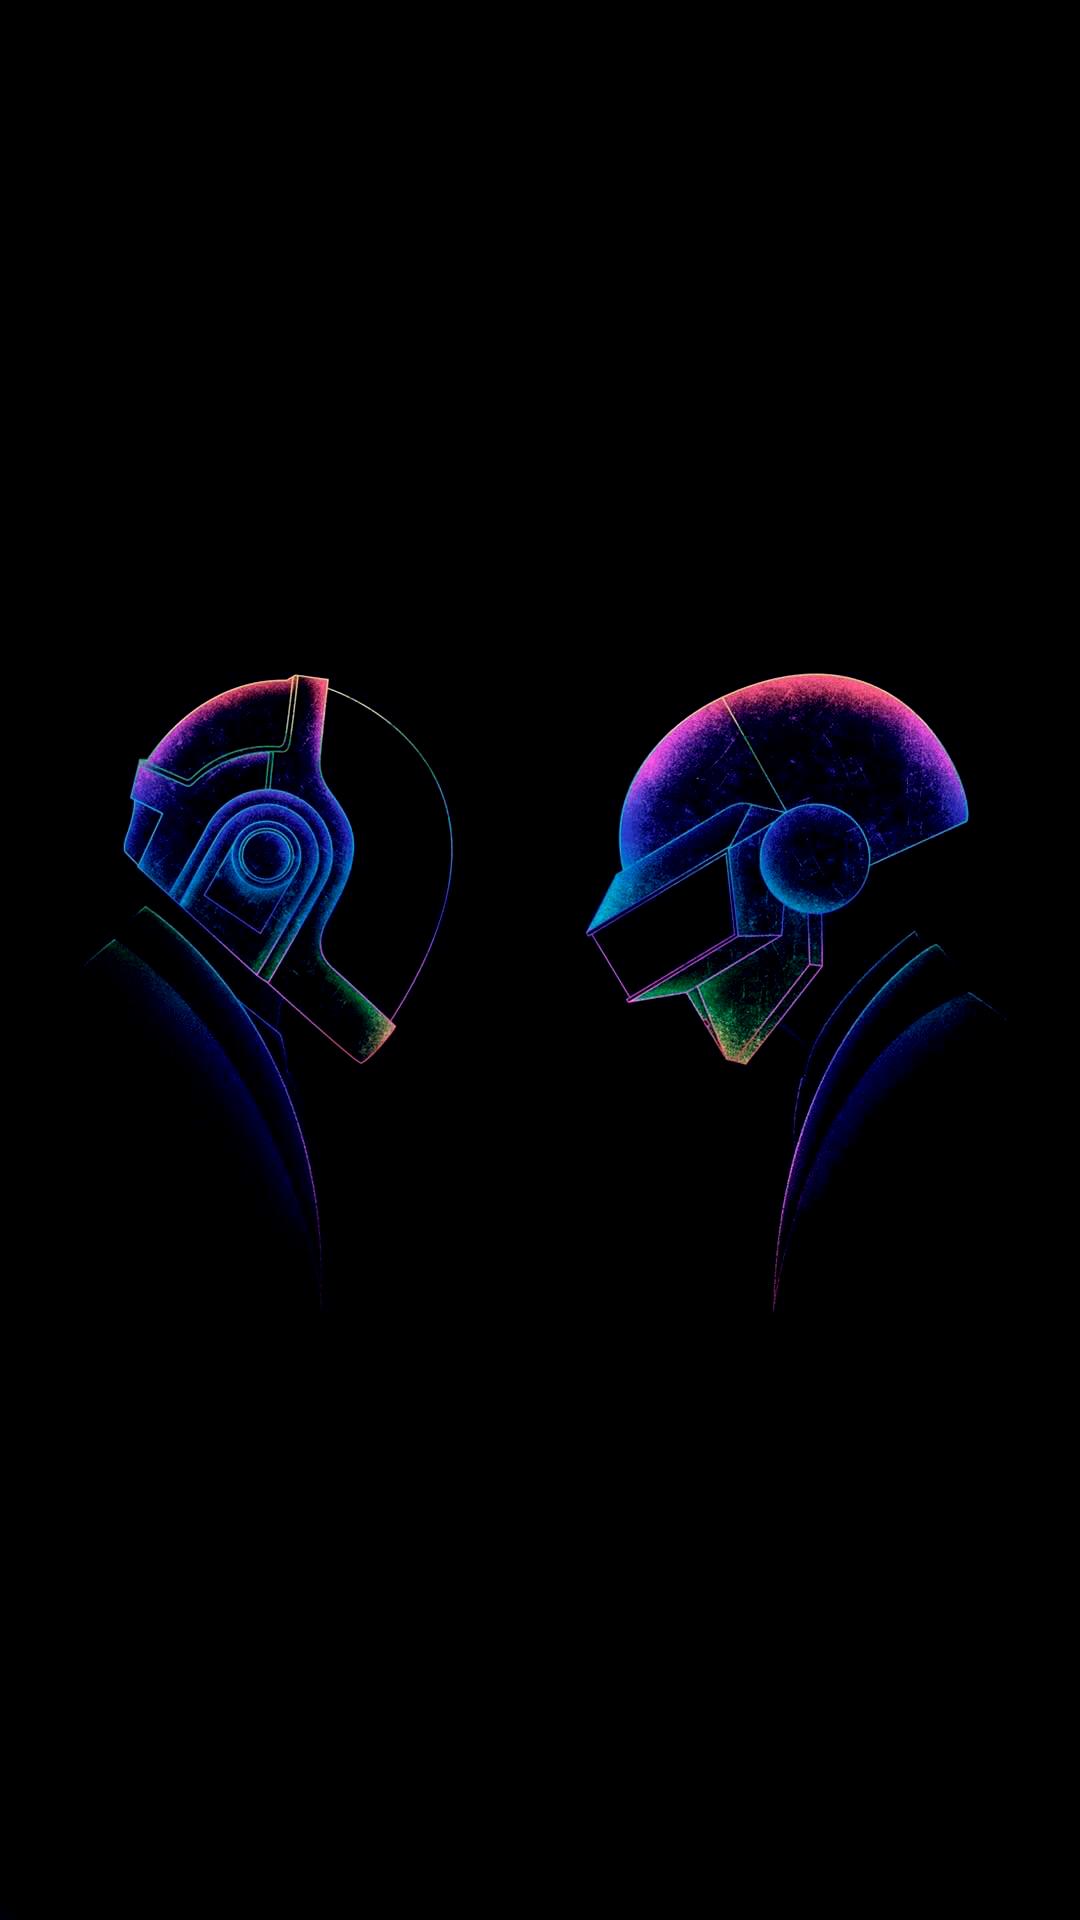 Daft Punk (xpost from r/AmoledBackgrounds) Descargas de